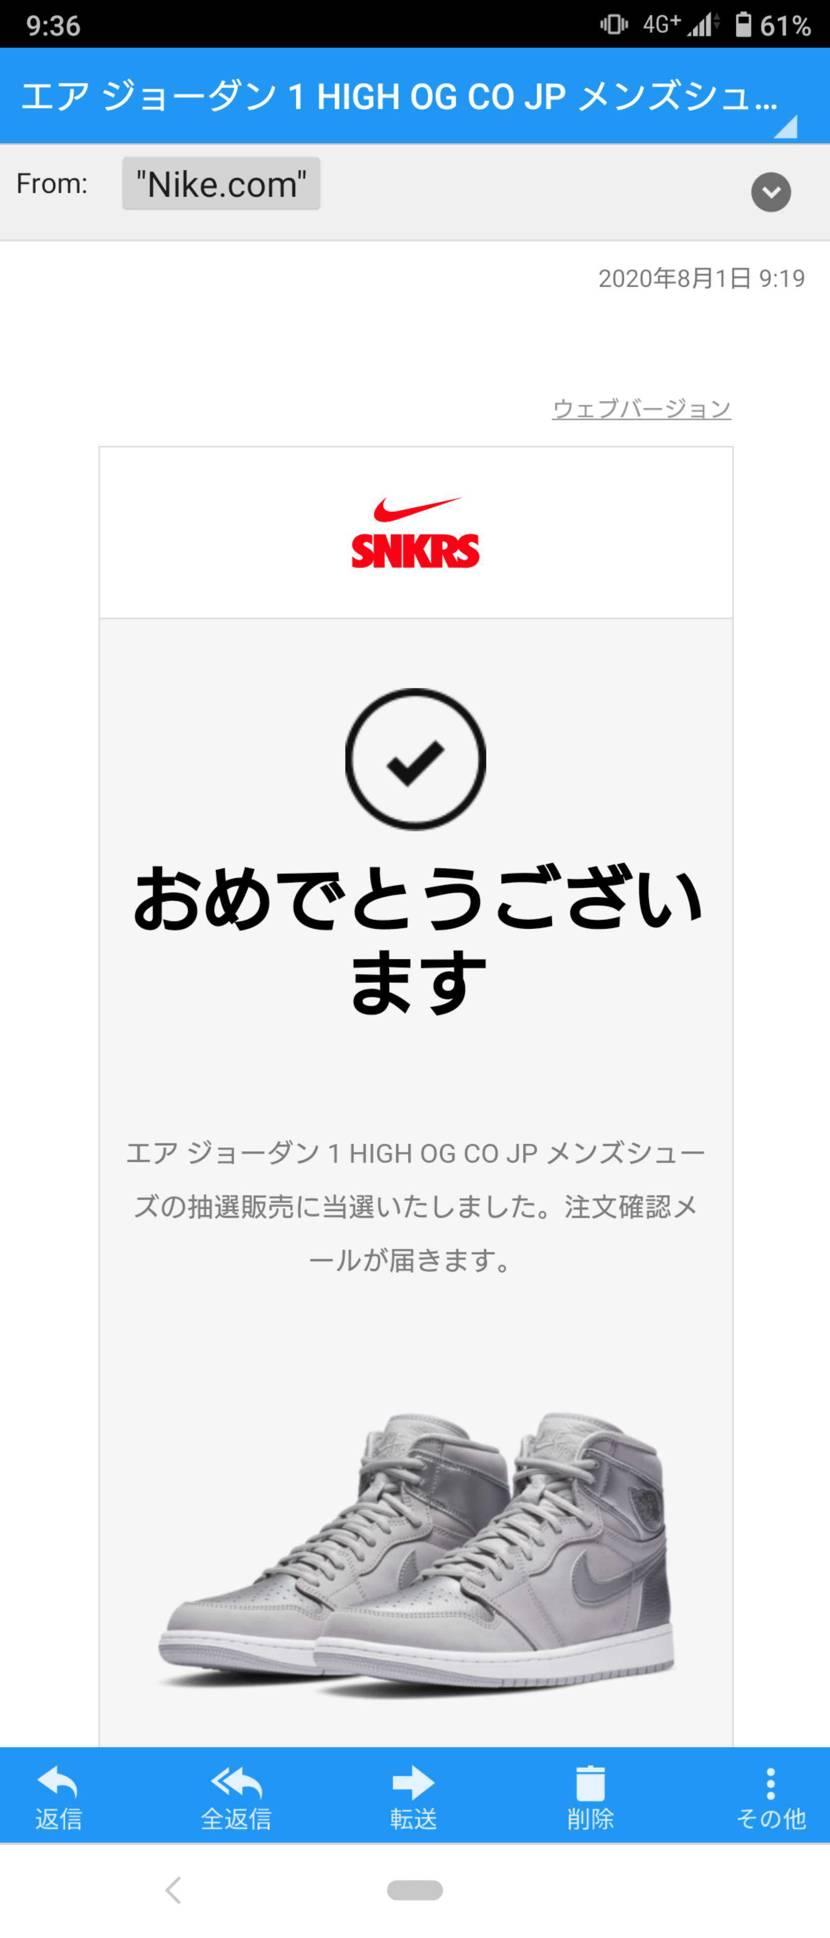 SNKRSにて買えました!!  日本限定、、限定に弱い、、買えて良かった😆